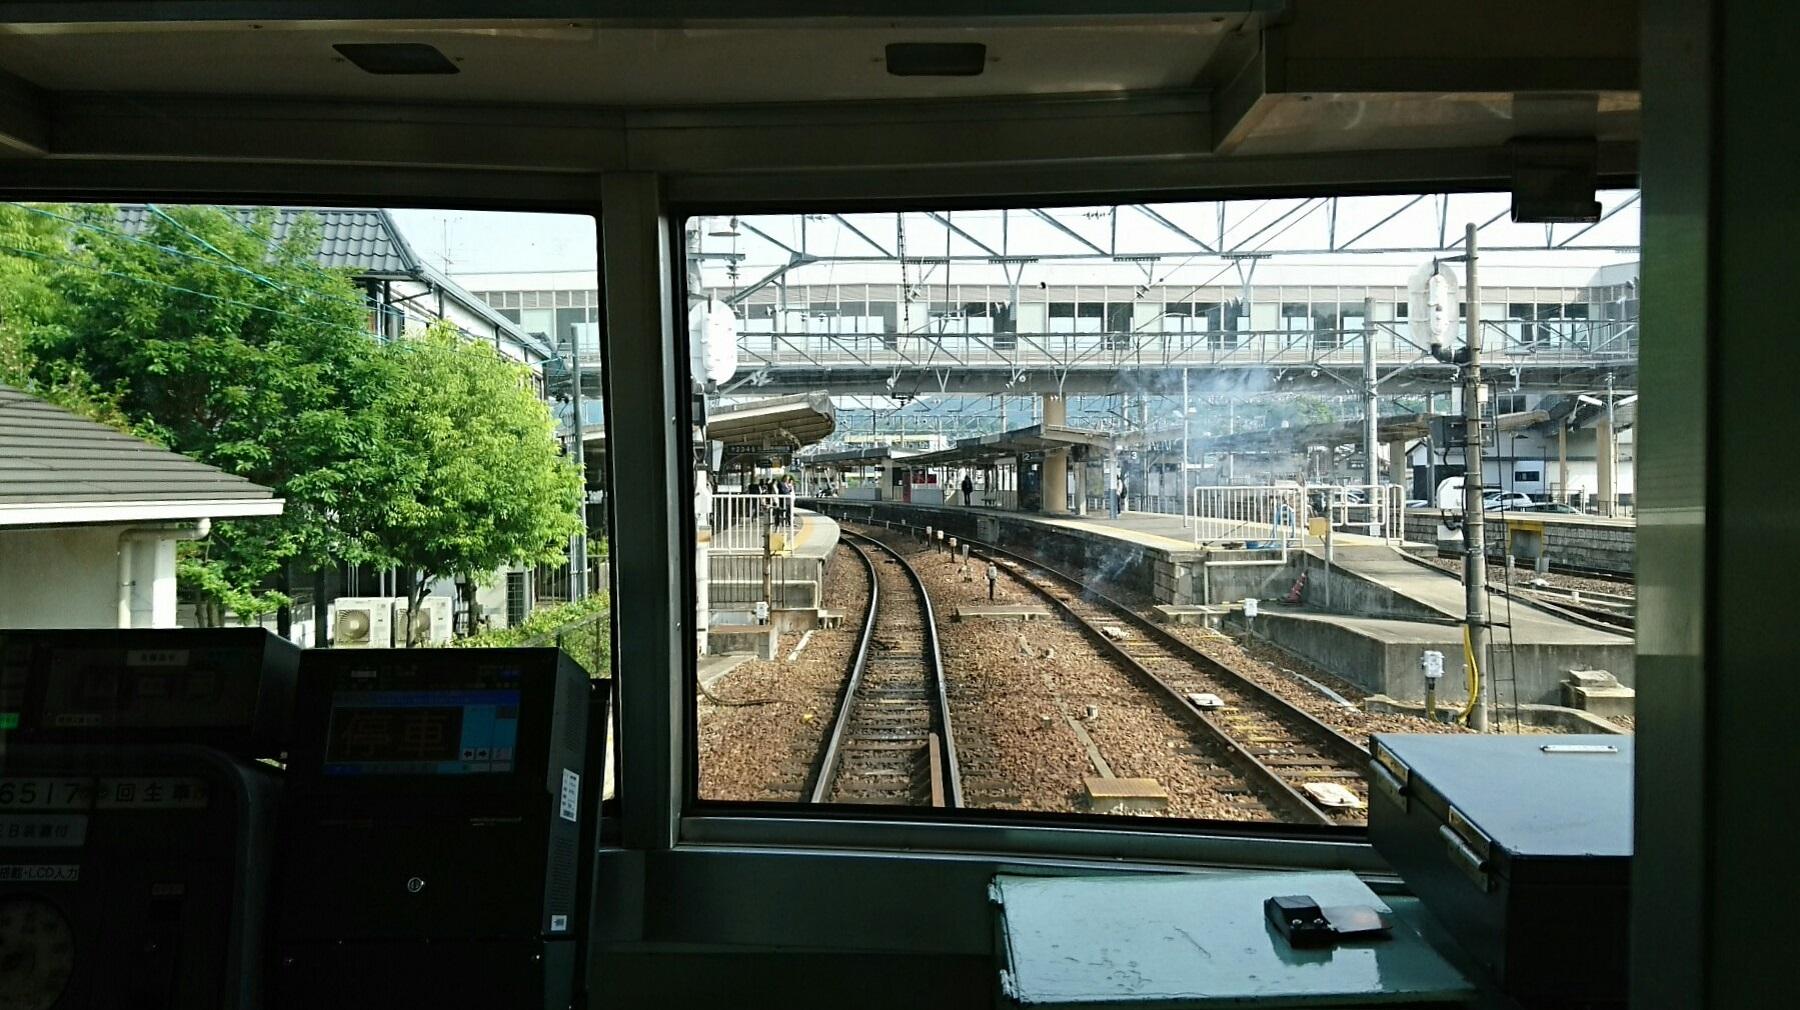 2018.5.16 美濃市 (15) 犬山経由岐阜いき急行 - 新鵜沼 1800-1010